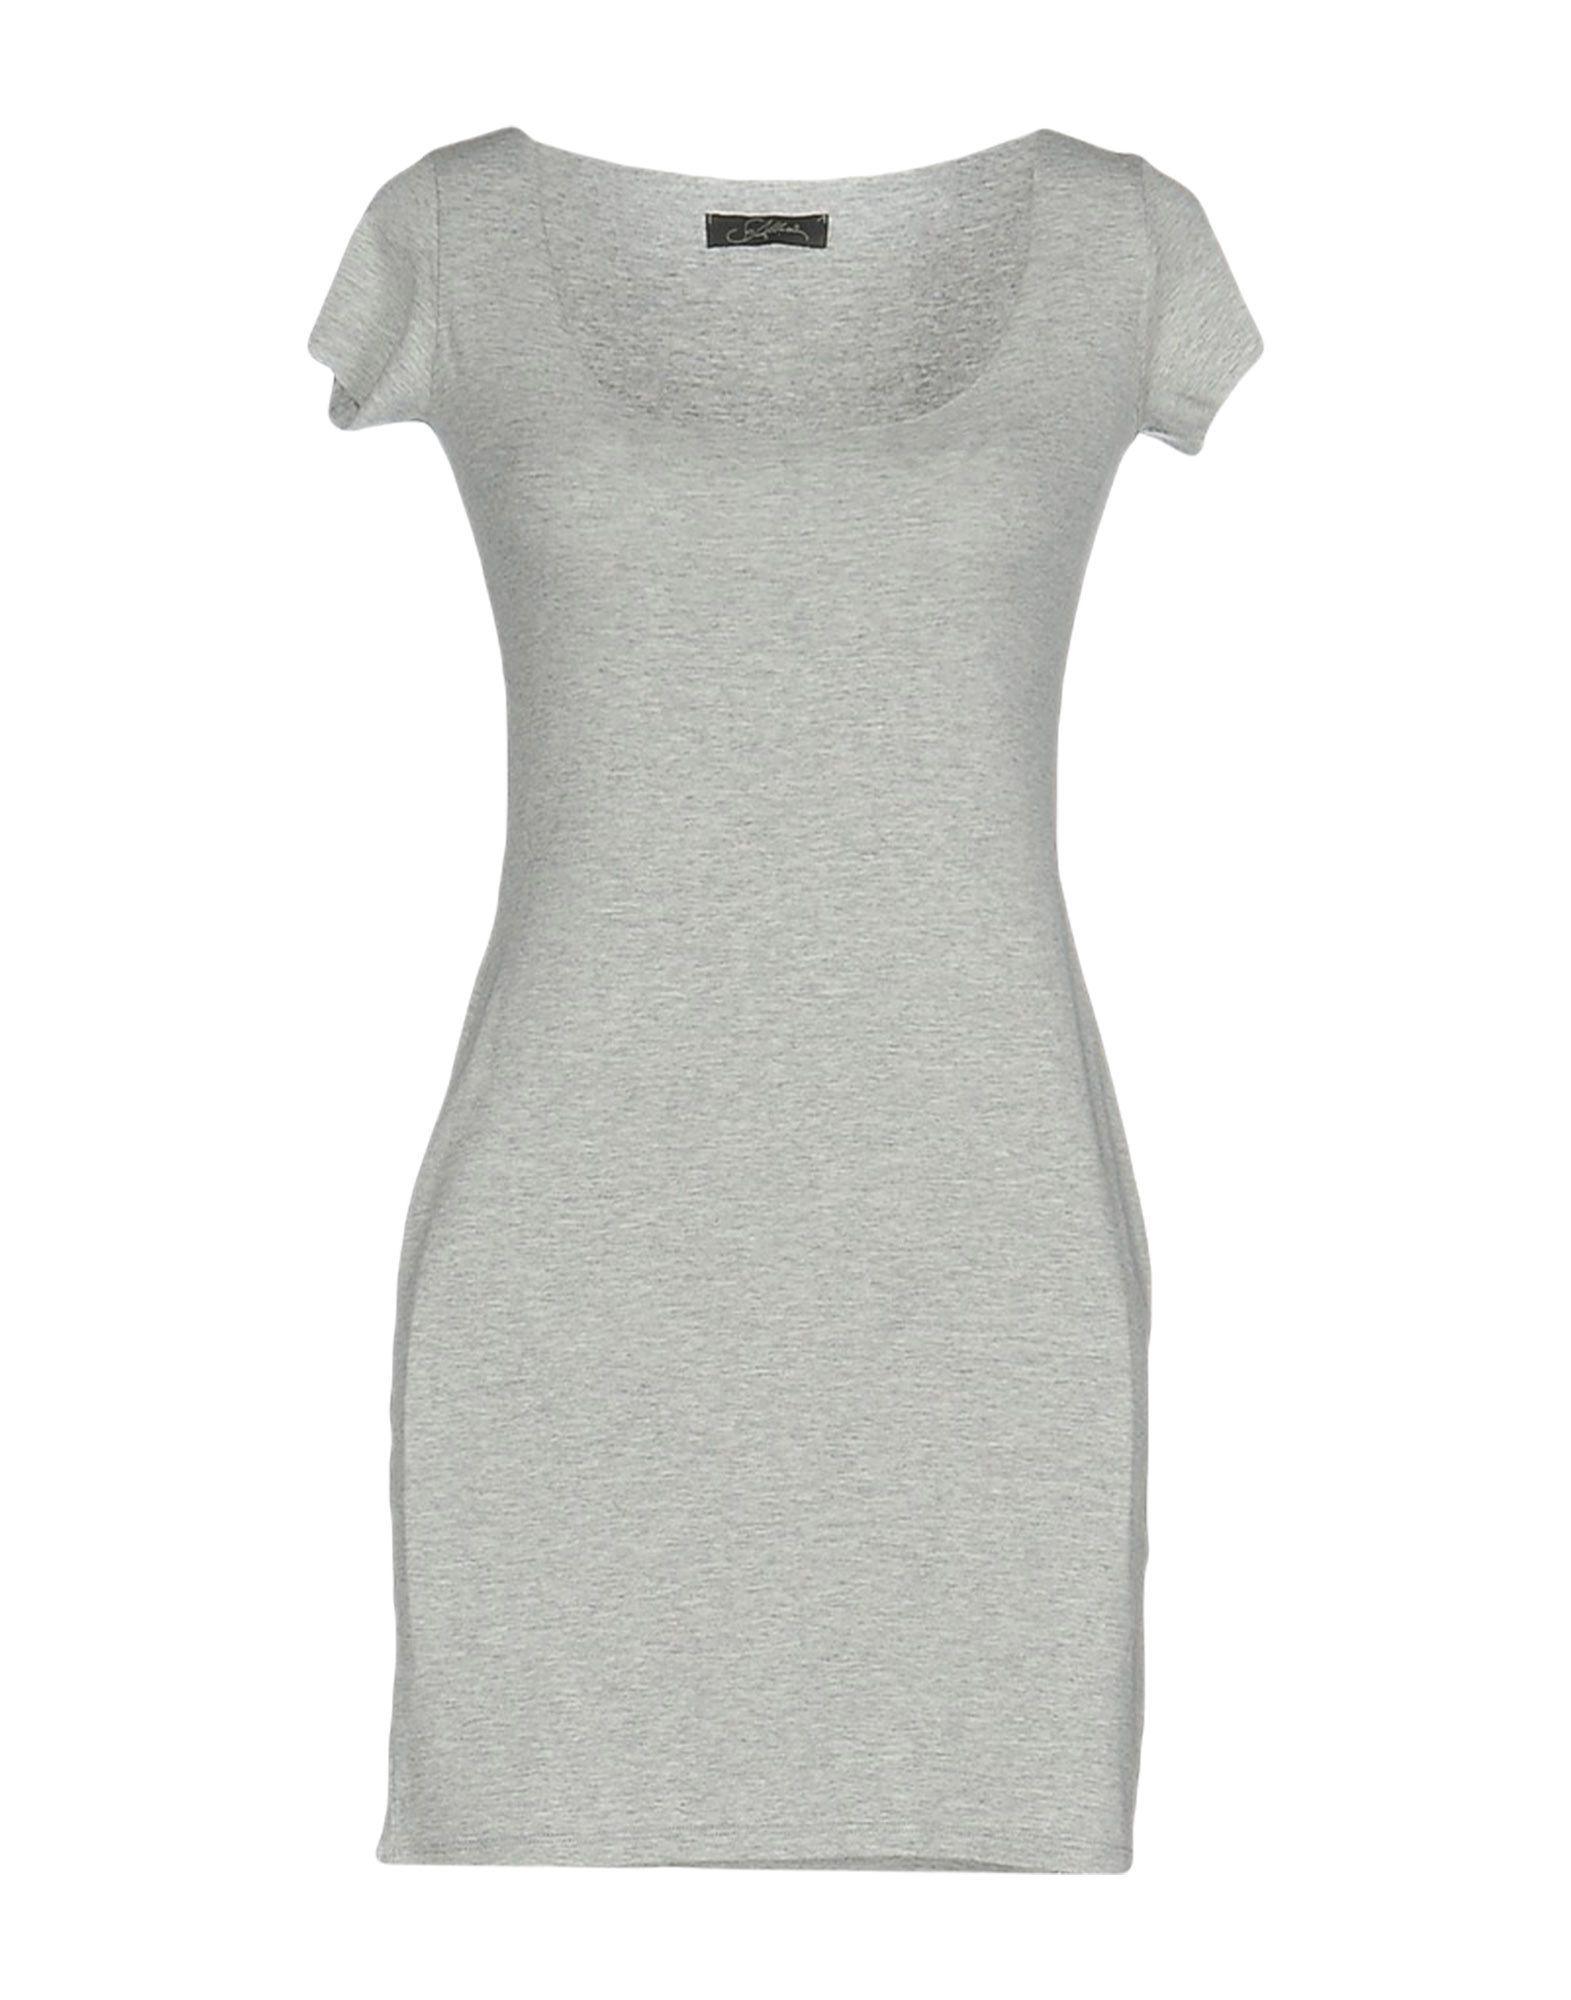 DRESSES - Short dresses SoAllure KmTQP